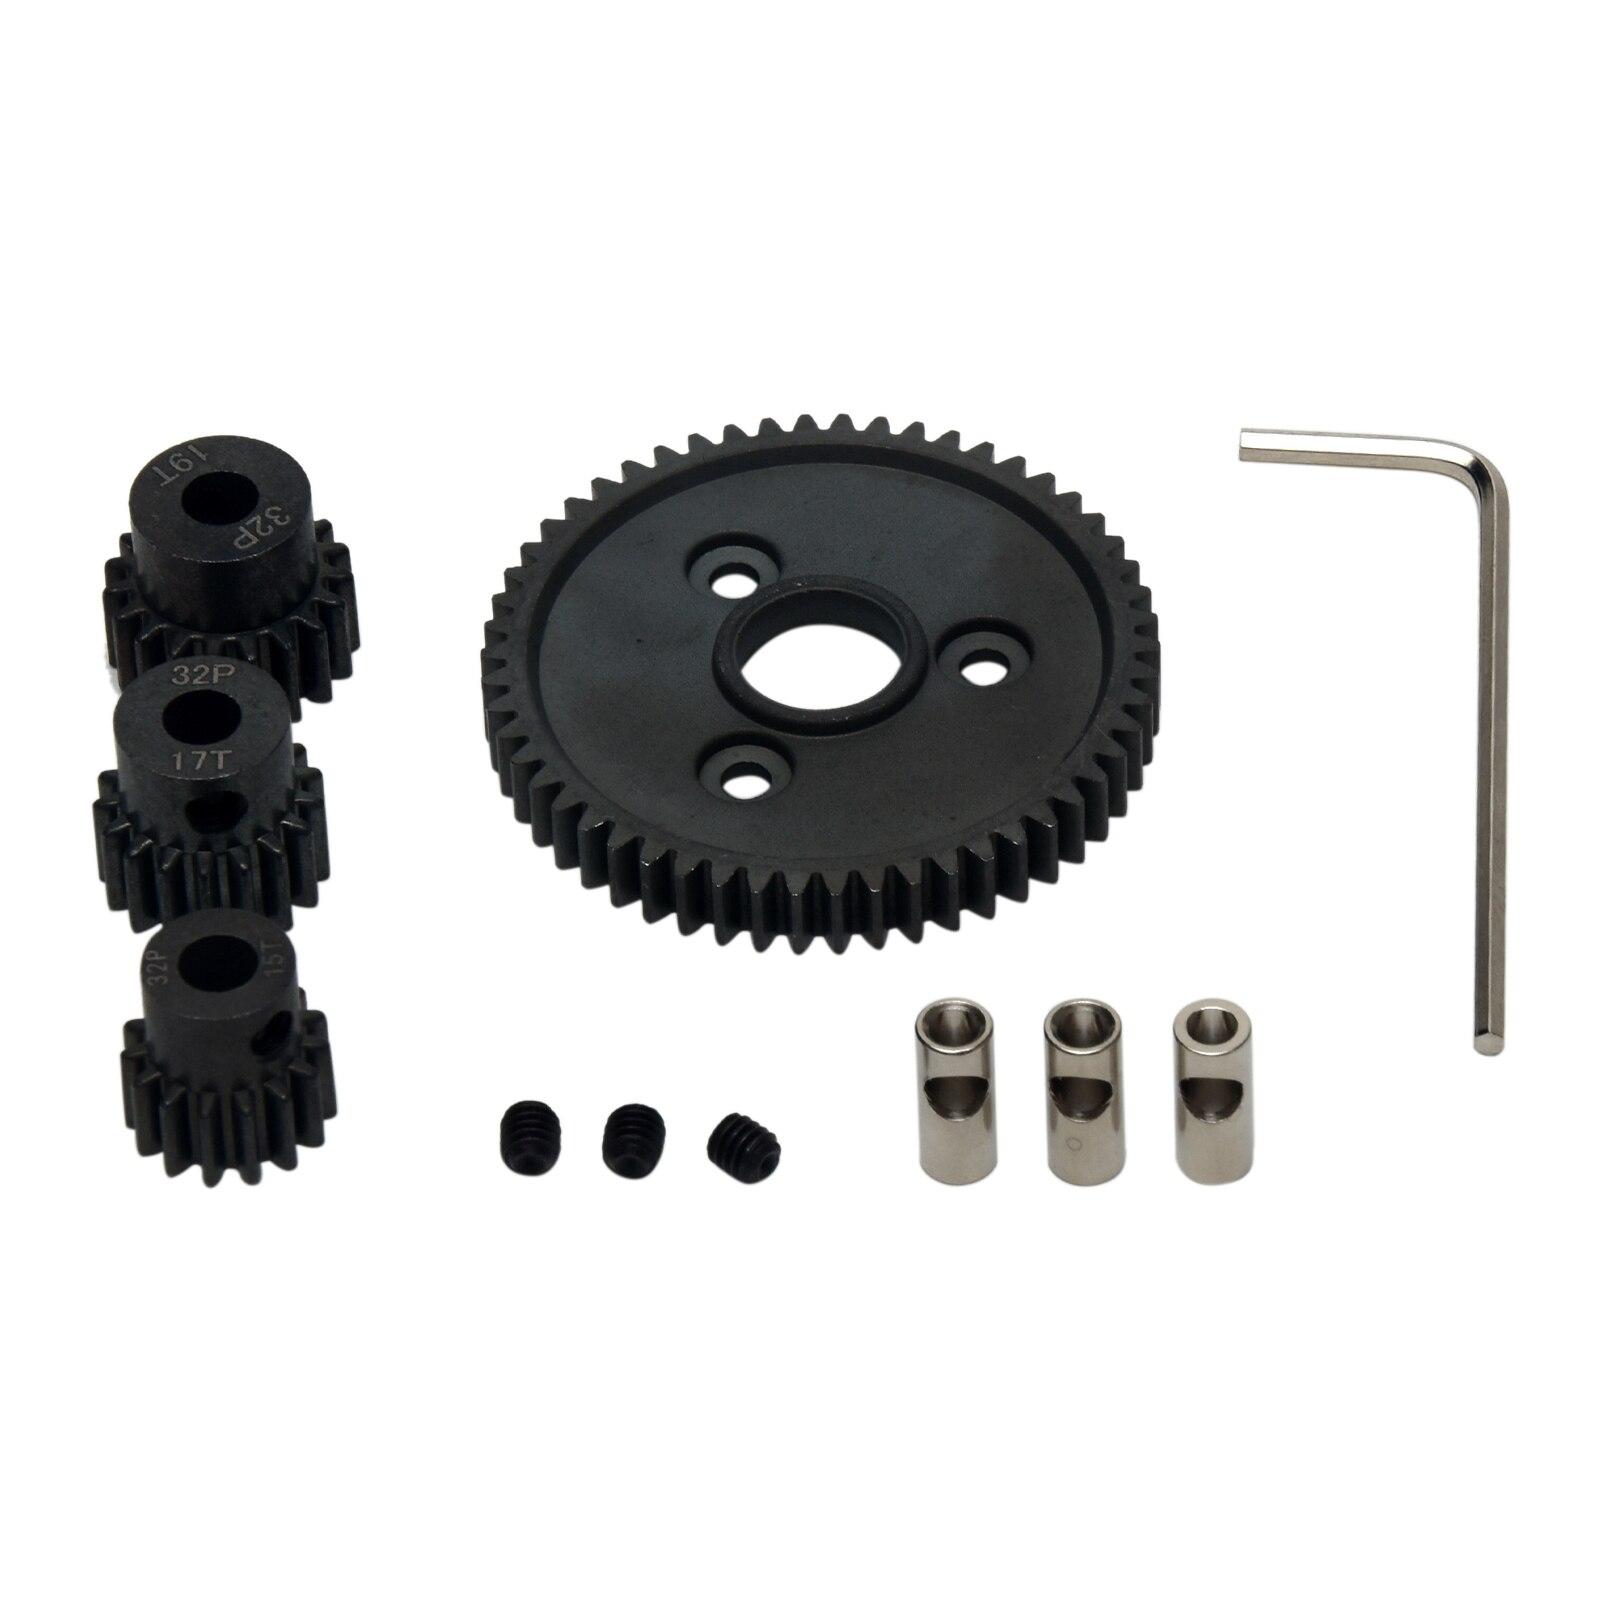 RC Car 54T Repair 1:10 Replacement Parts 0.8 Metric Pitch Metal Steel Durable Kids Toy Motor Spur Ge